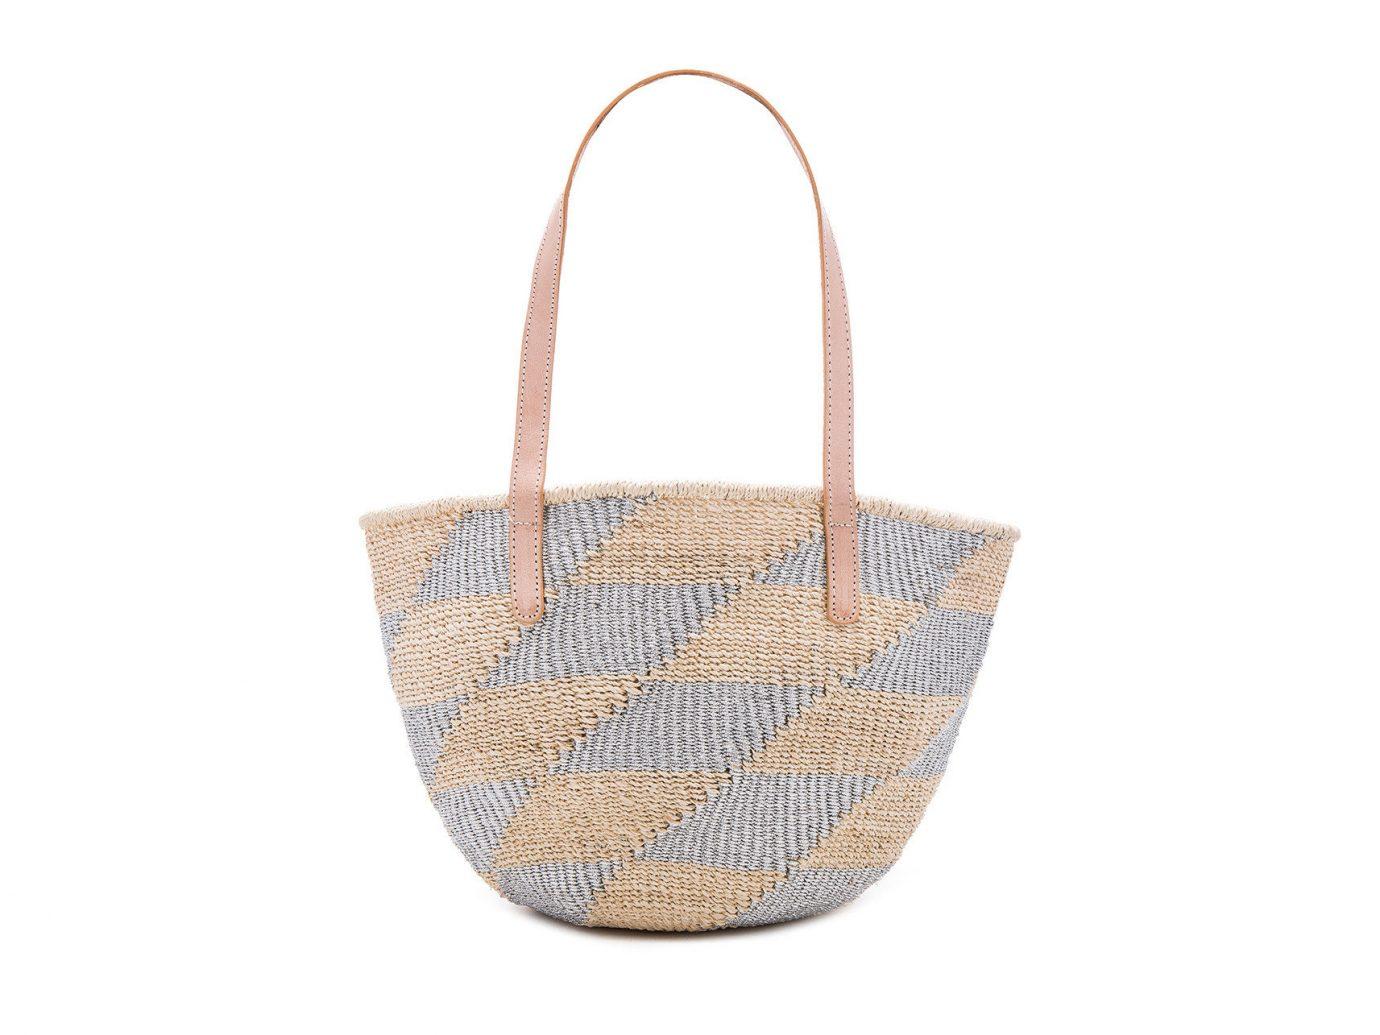 Style + Design handbag bag basket shoulder bag fashion accessory tote bag beige pattern container accessory